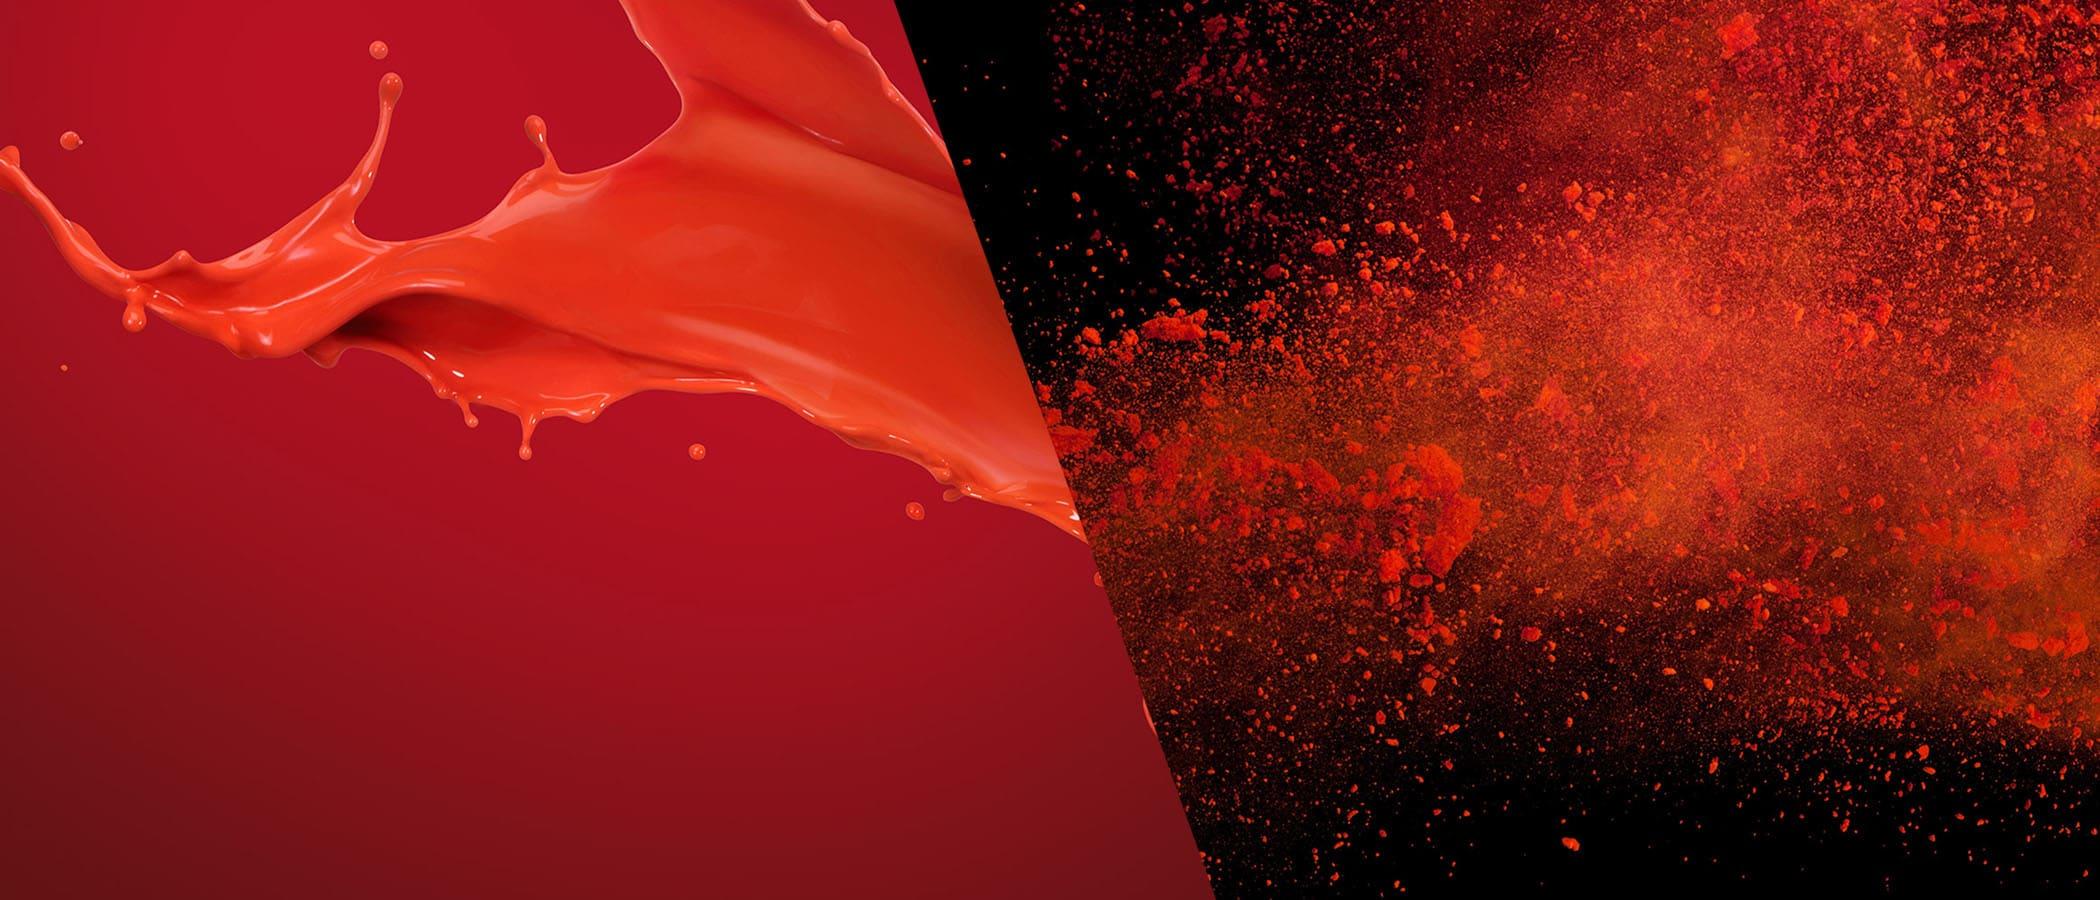 Cardinal Paint Powder Splash